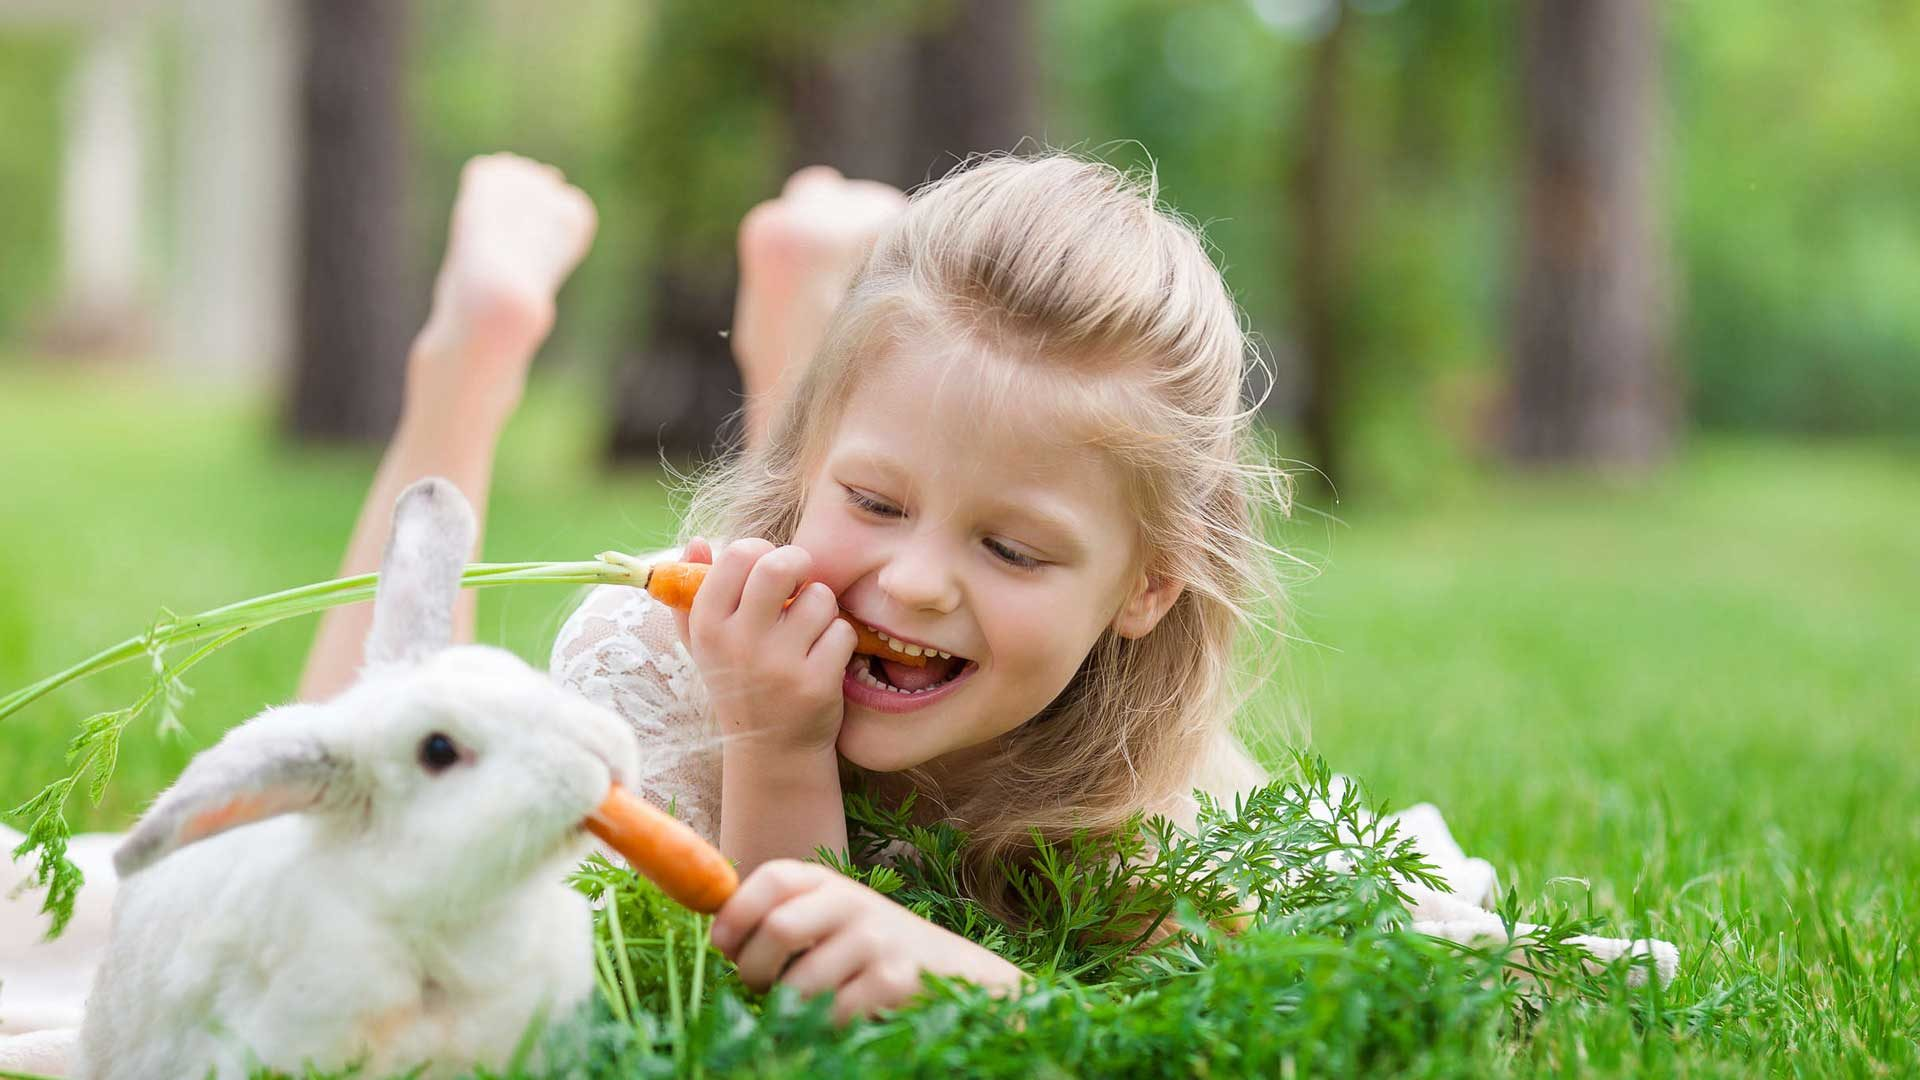 The bugs bunny kids